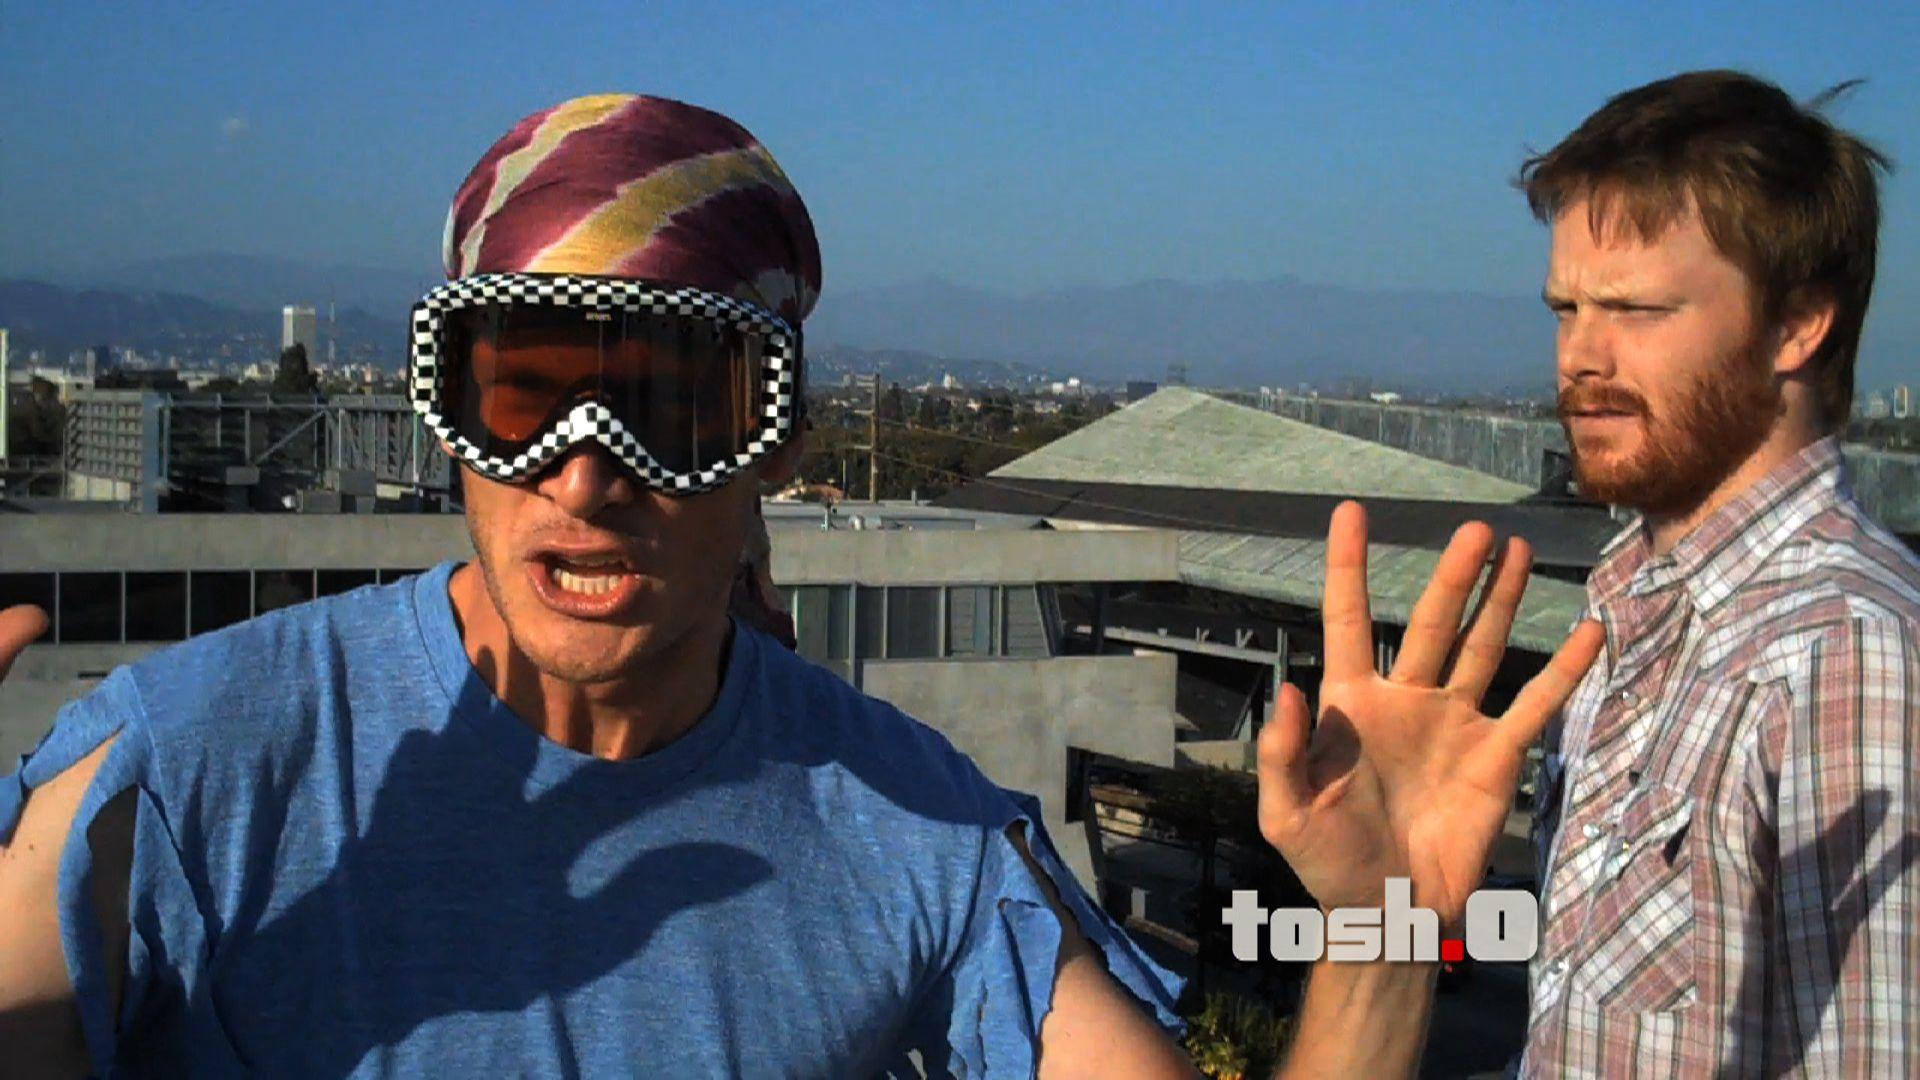 Macho Man Randy Savage Impressions Tosh 0 Video Clip Comedy